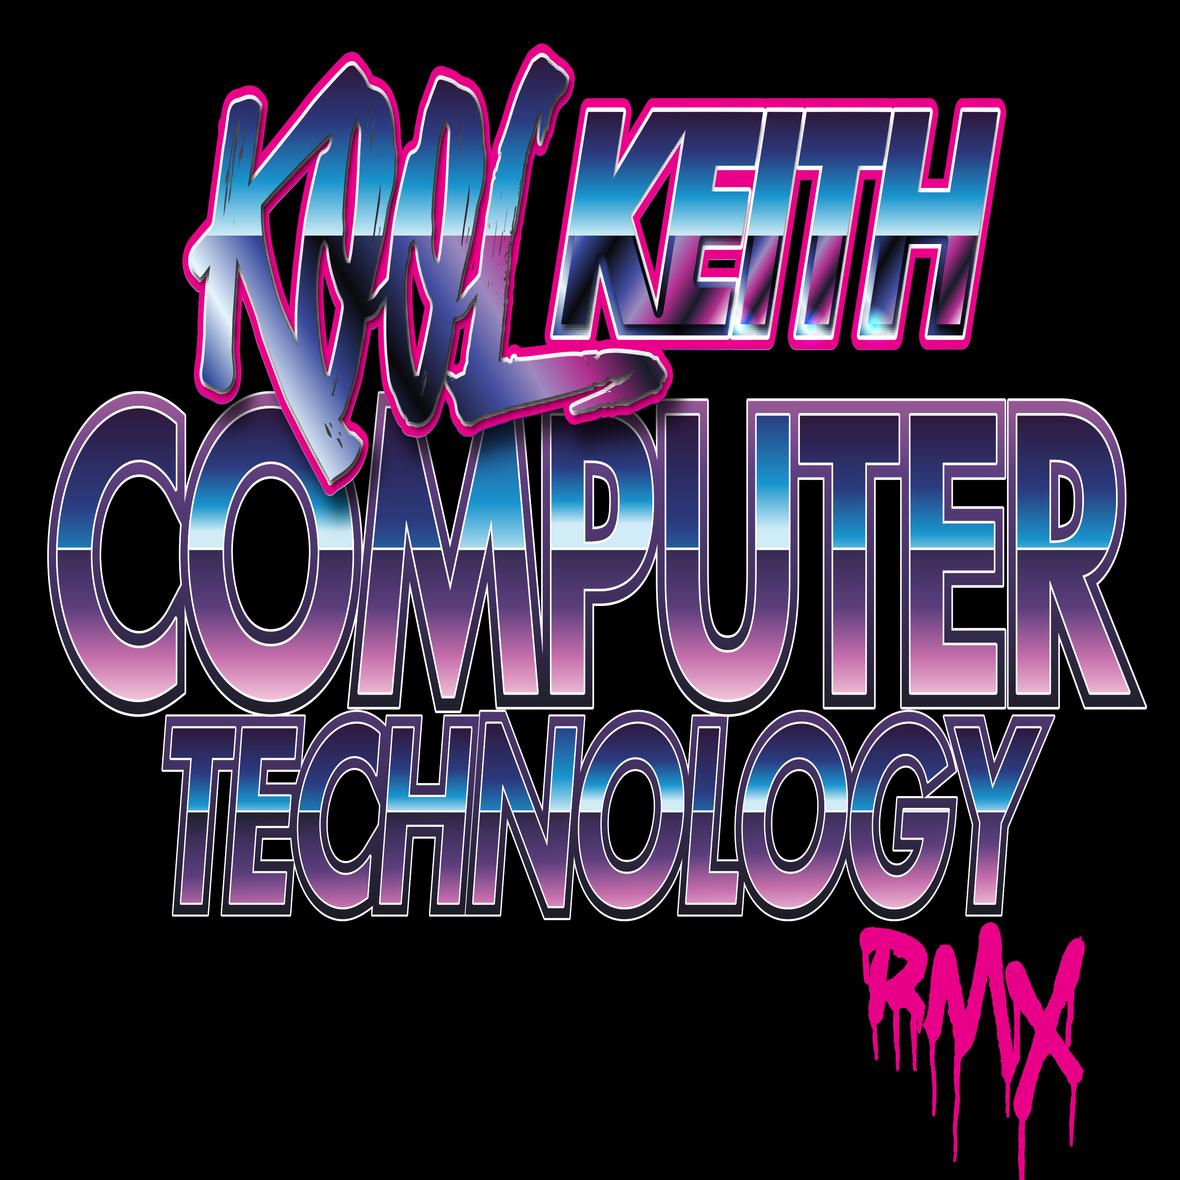 Kool Keith - Computer Technology [RMX]